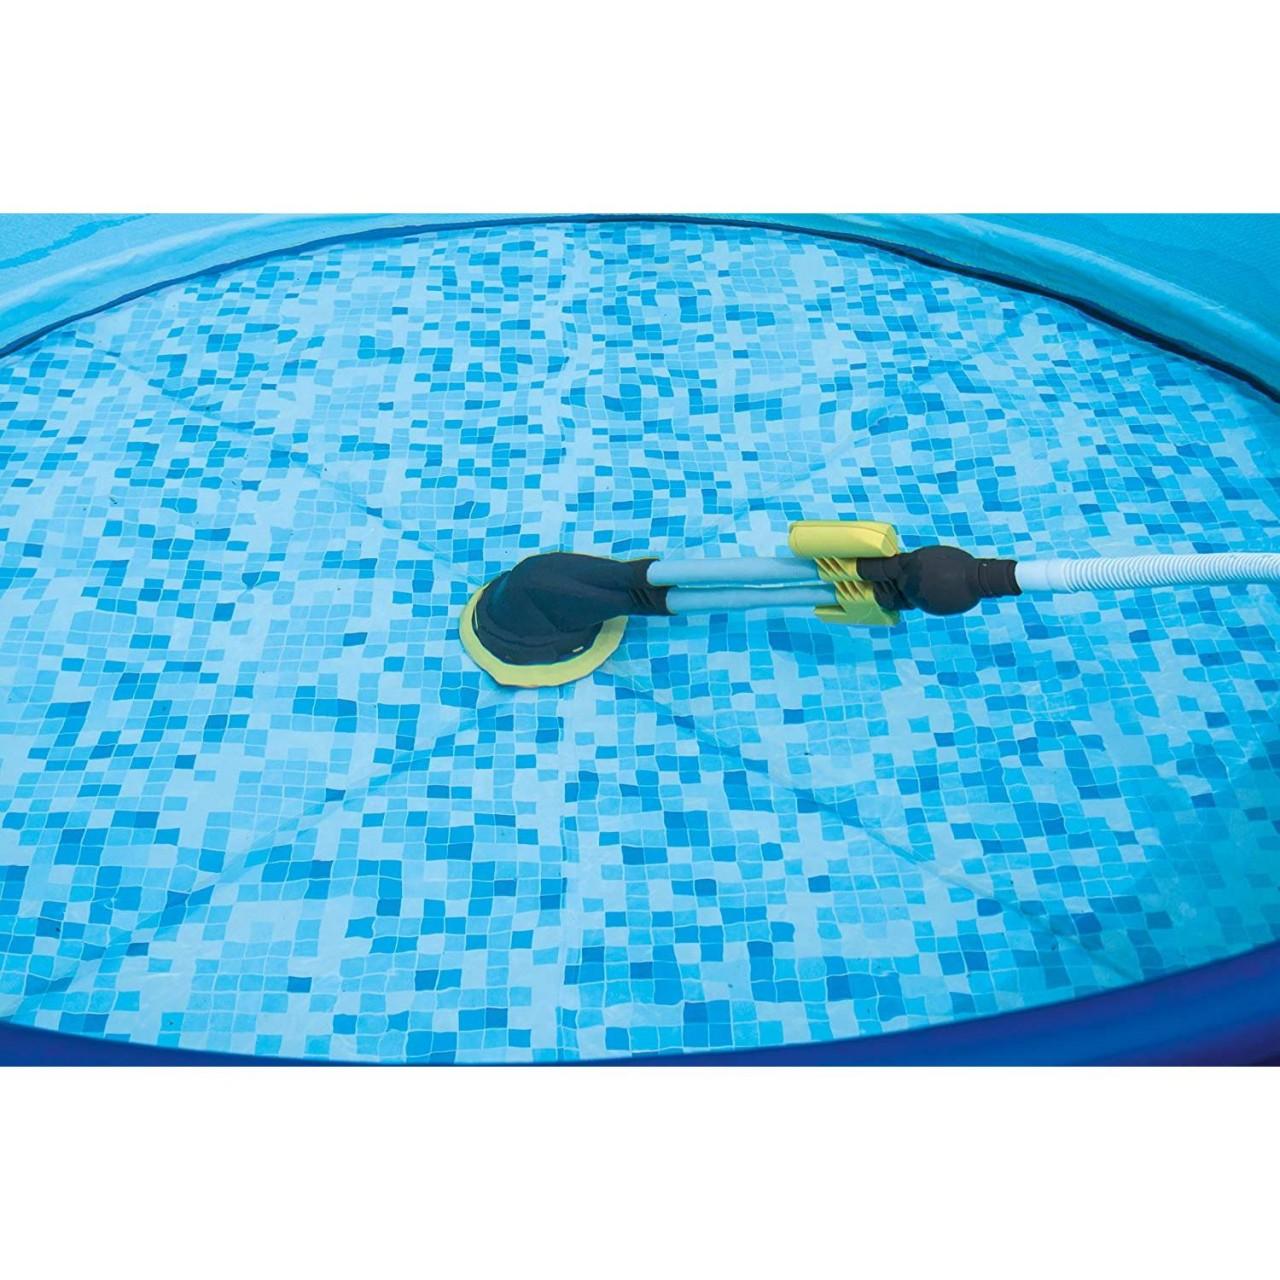 Bestway Flowclear AquaClimb automatischer Poolsauger Poolreiniger Sauger 58304